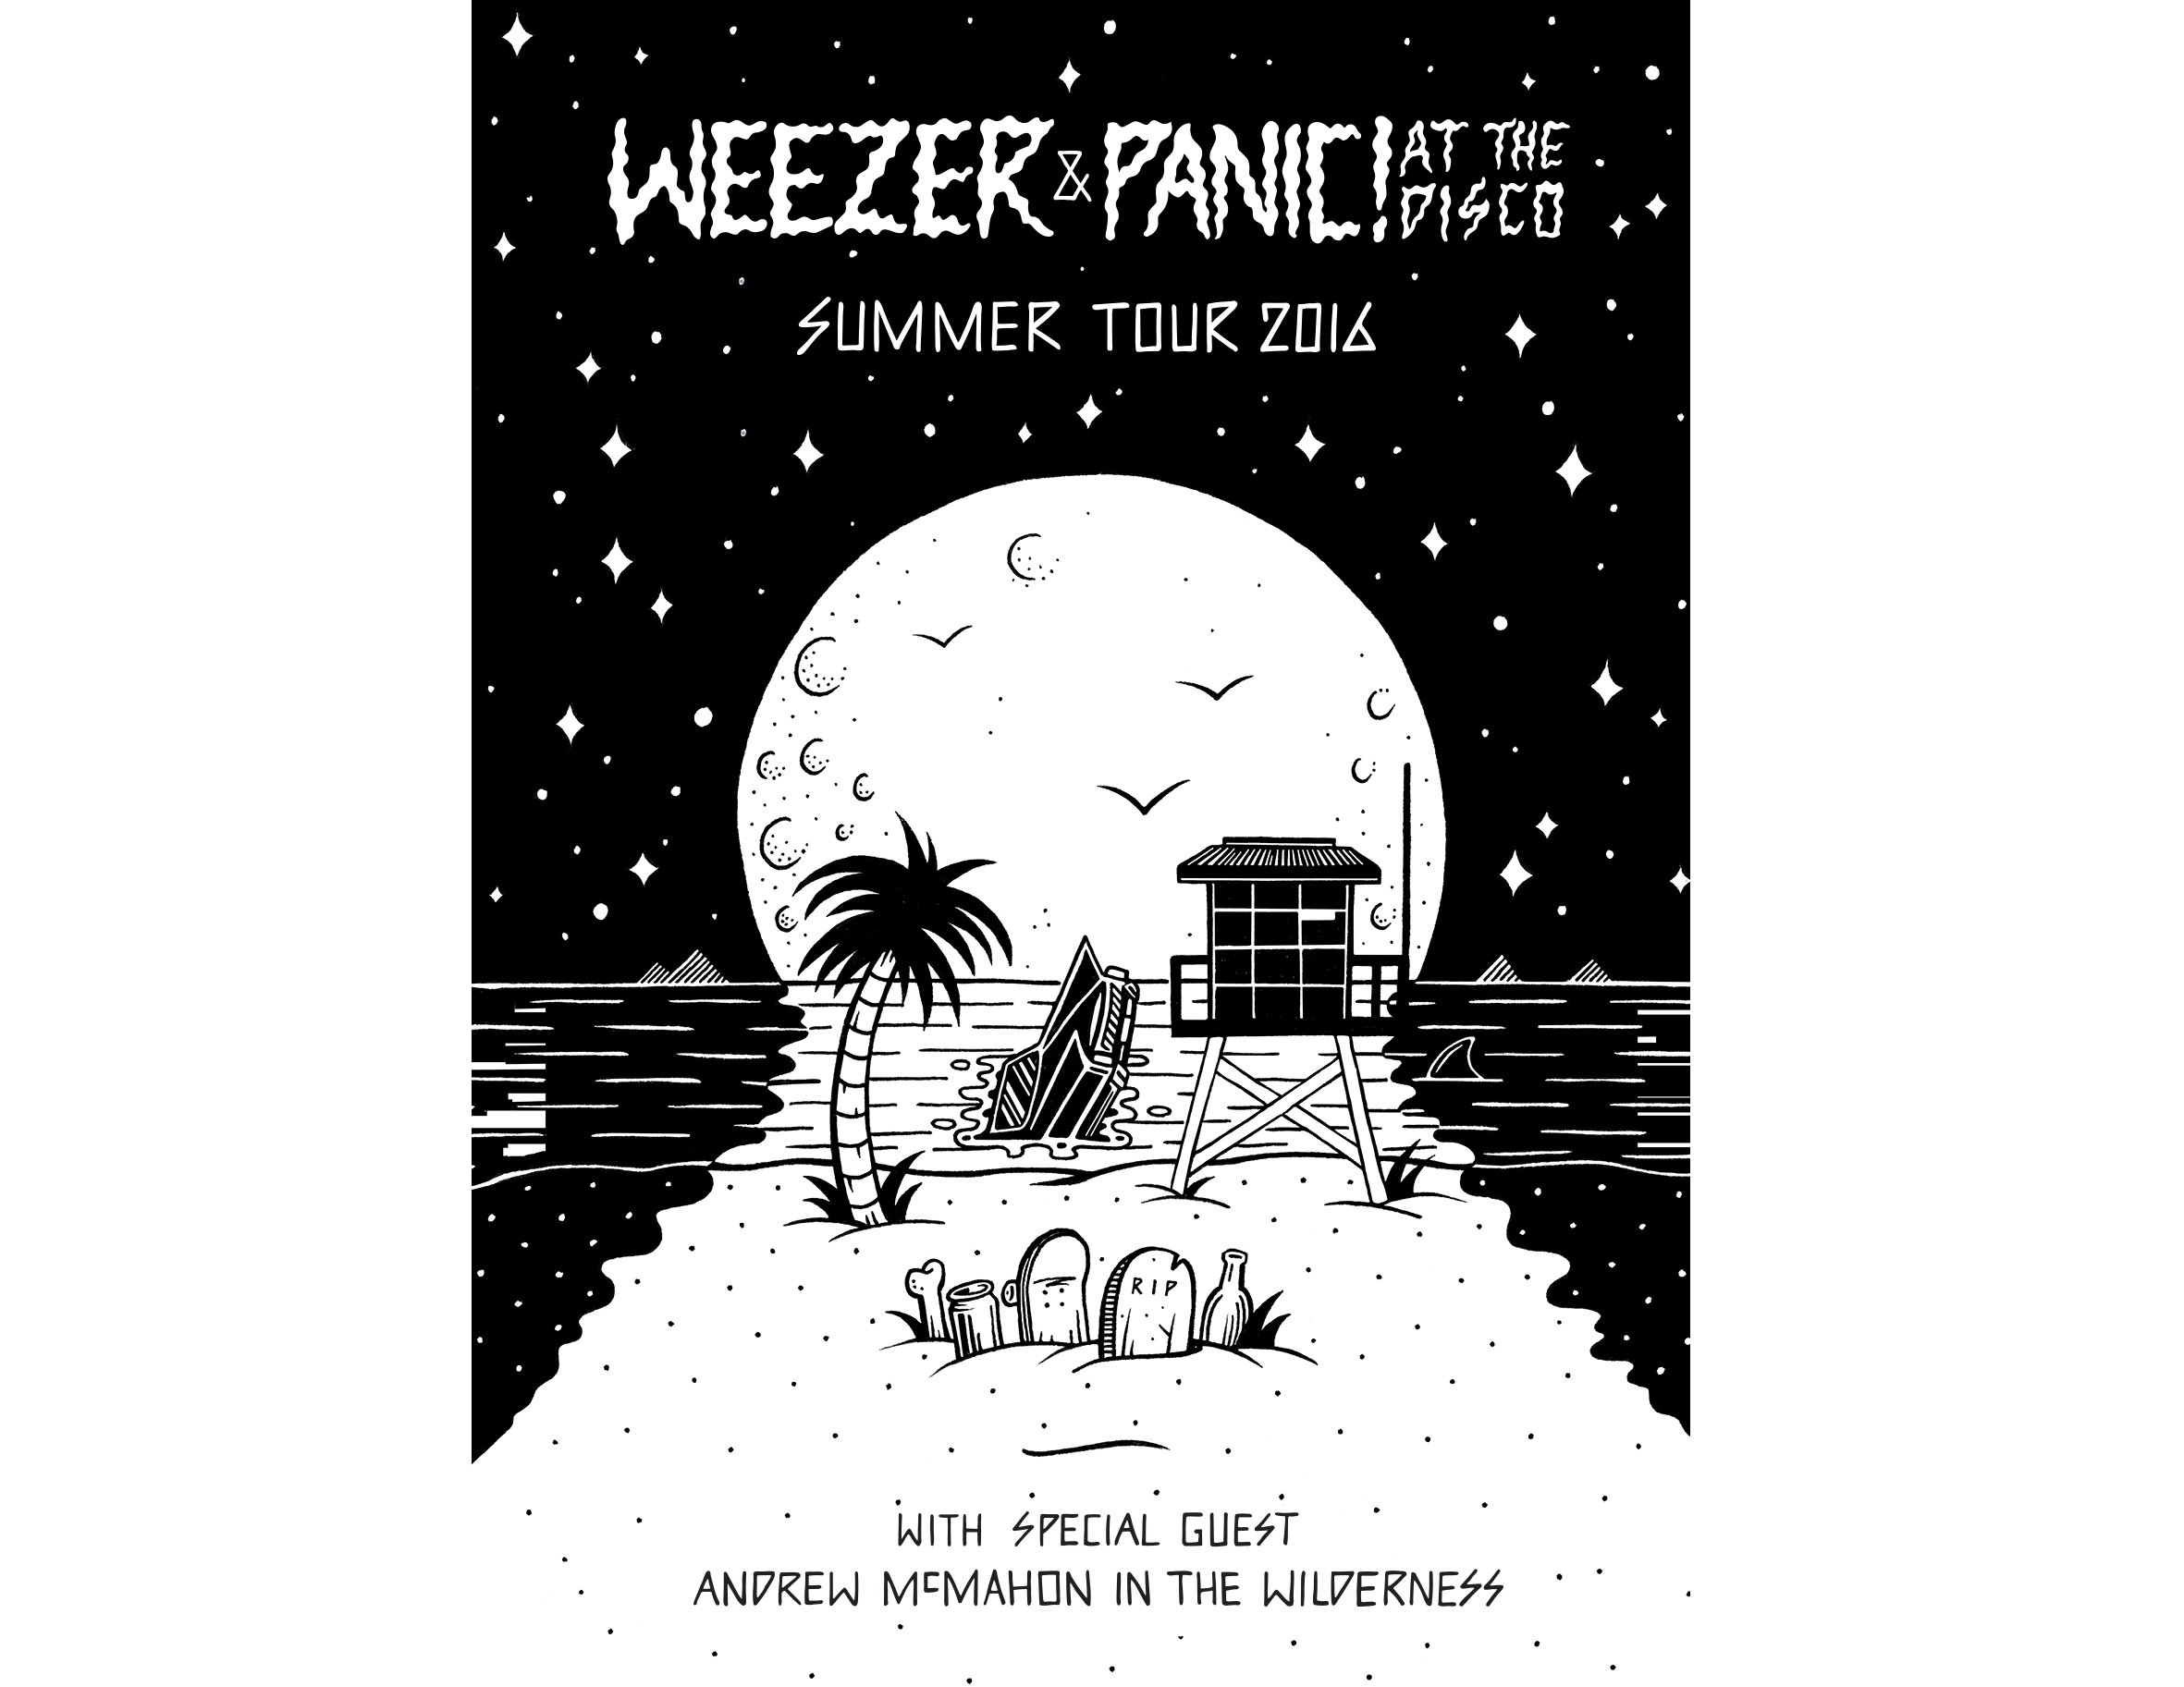 JB_Weezer_Panic-at-the-Disco-Summer-16-Tour.jpg